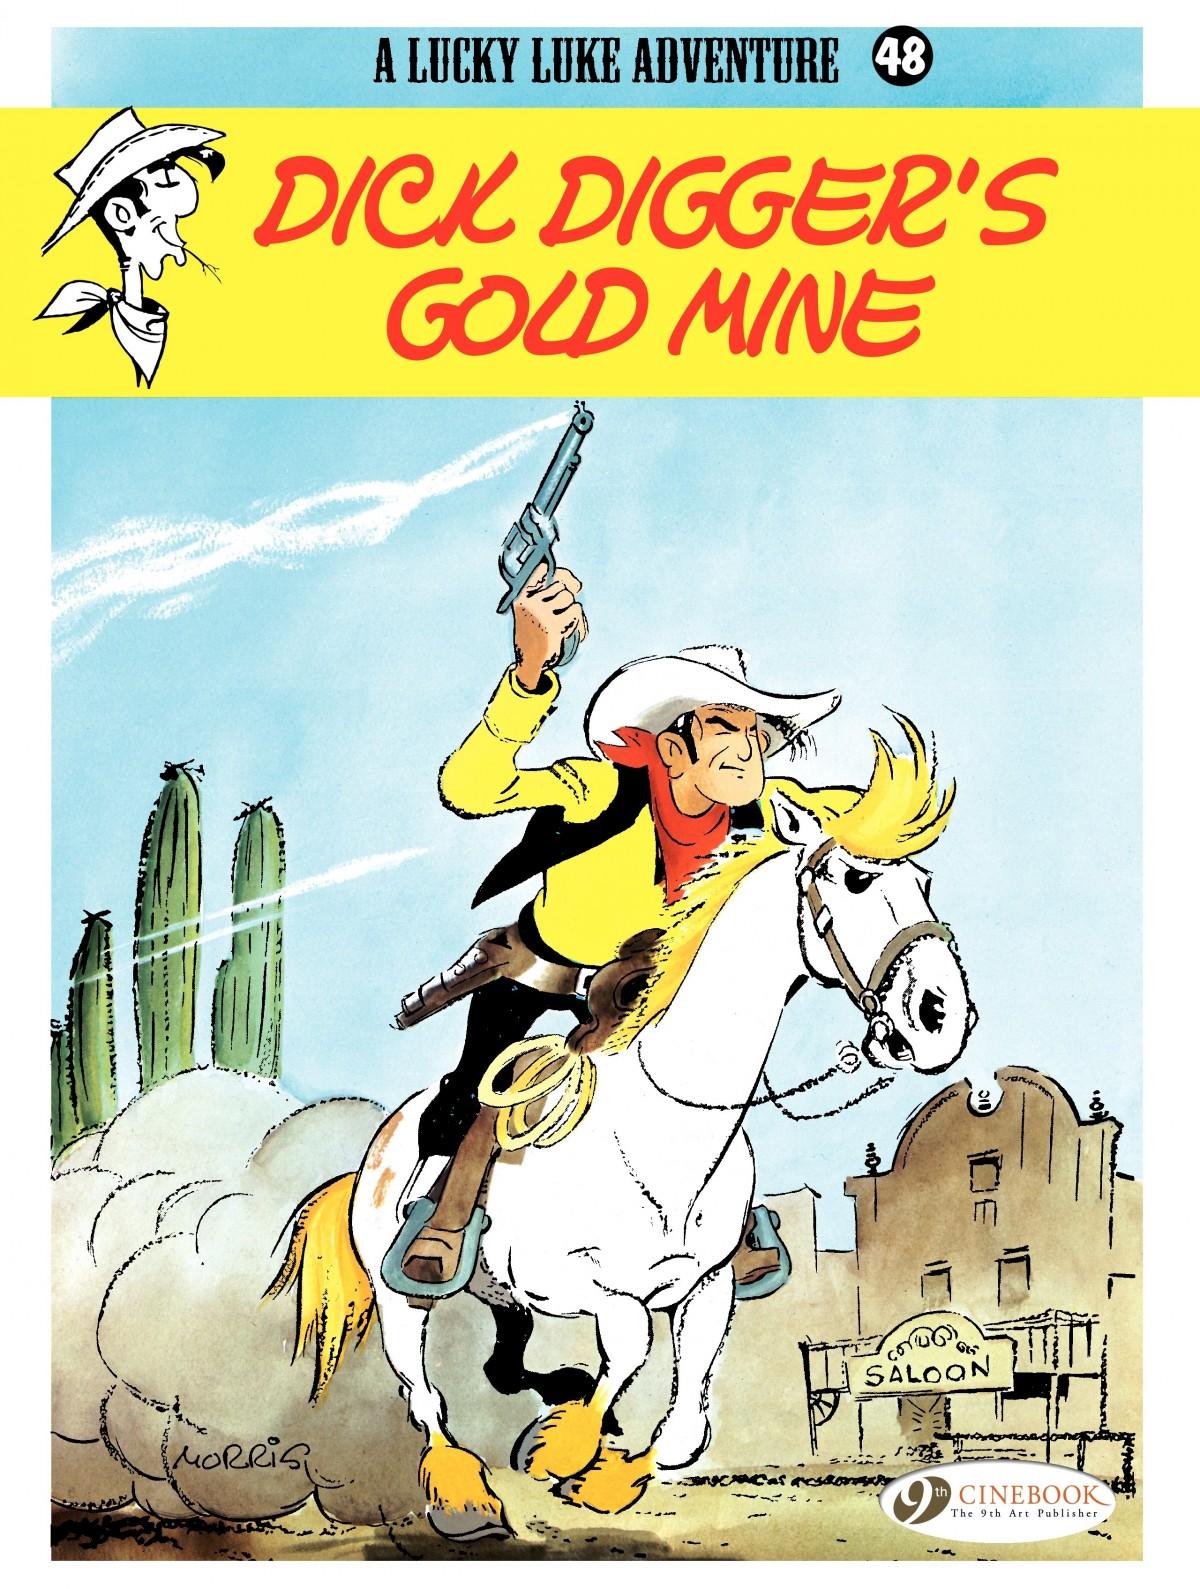 A Lucky Luke Adventure 48 Page 1